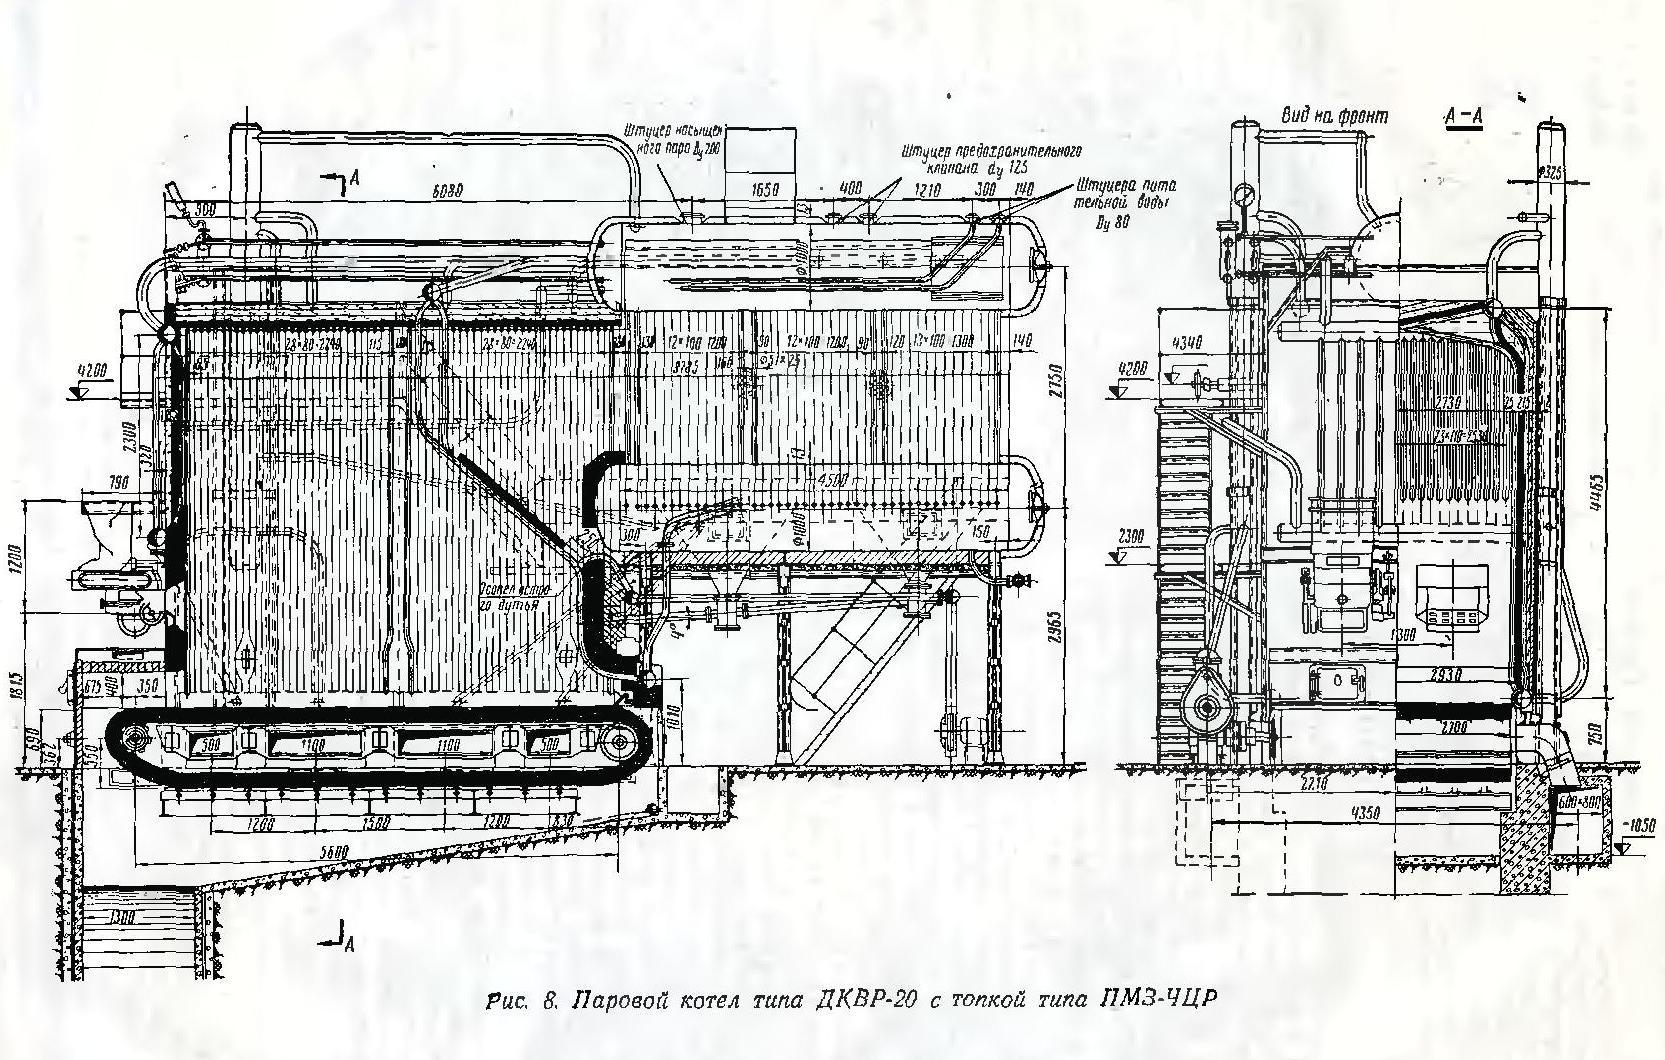 Схема топки котла дквр 10